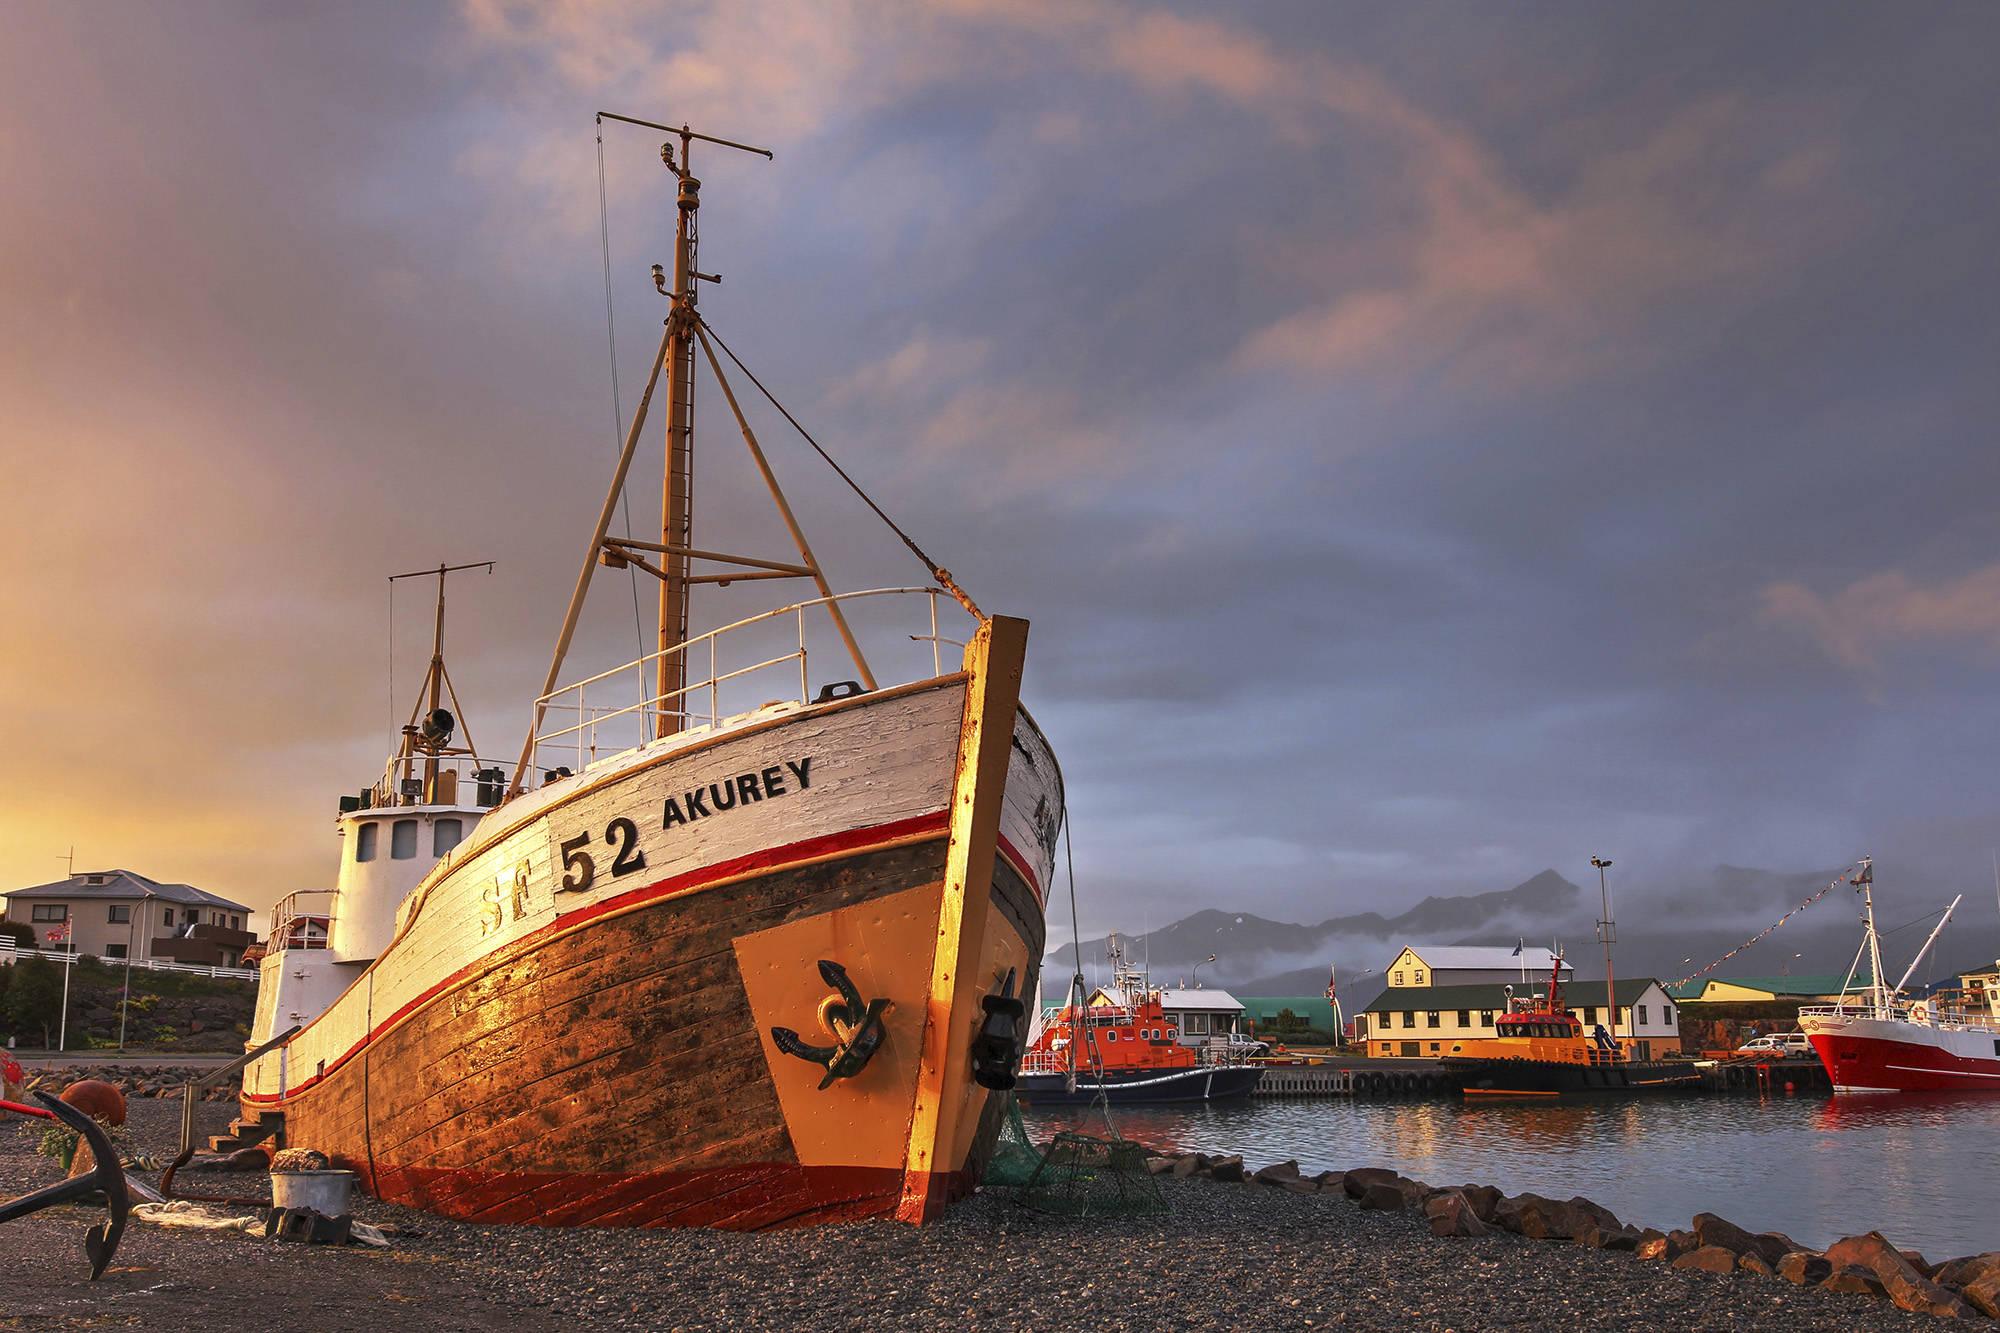 ISLANDA : Reykjavik e il meglio dell'Islanda